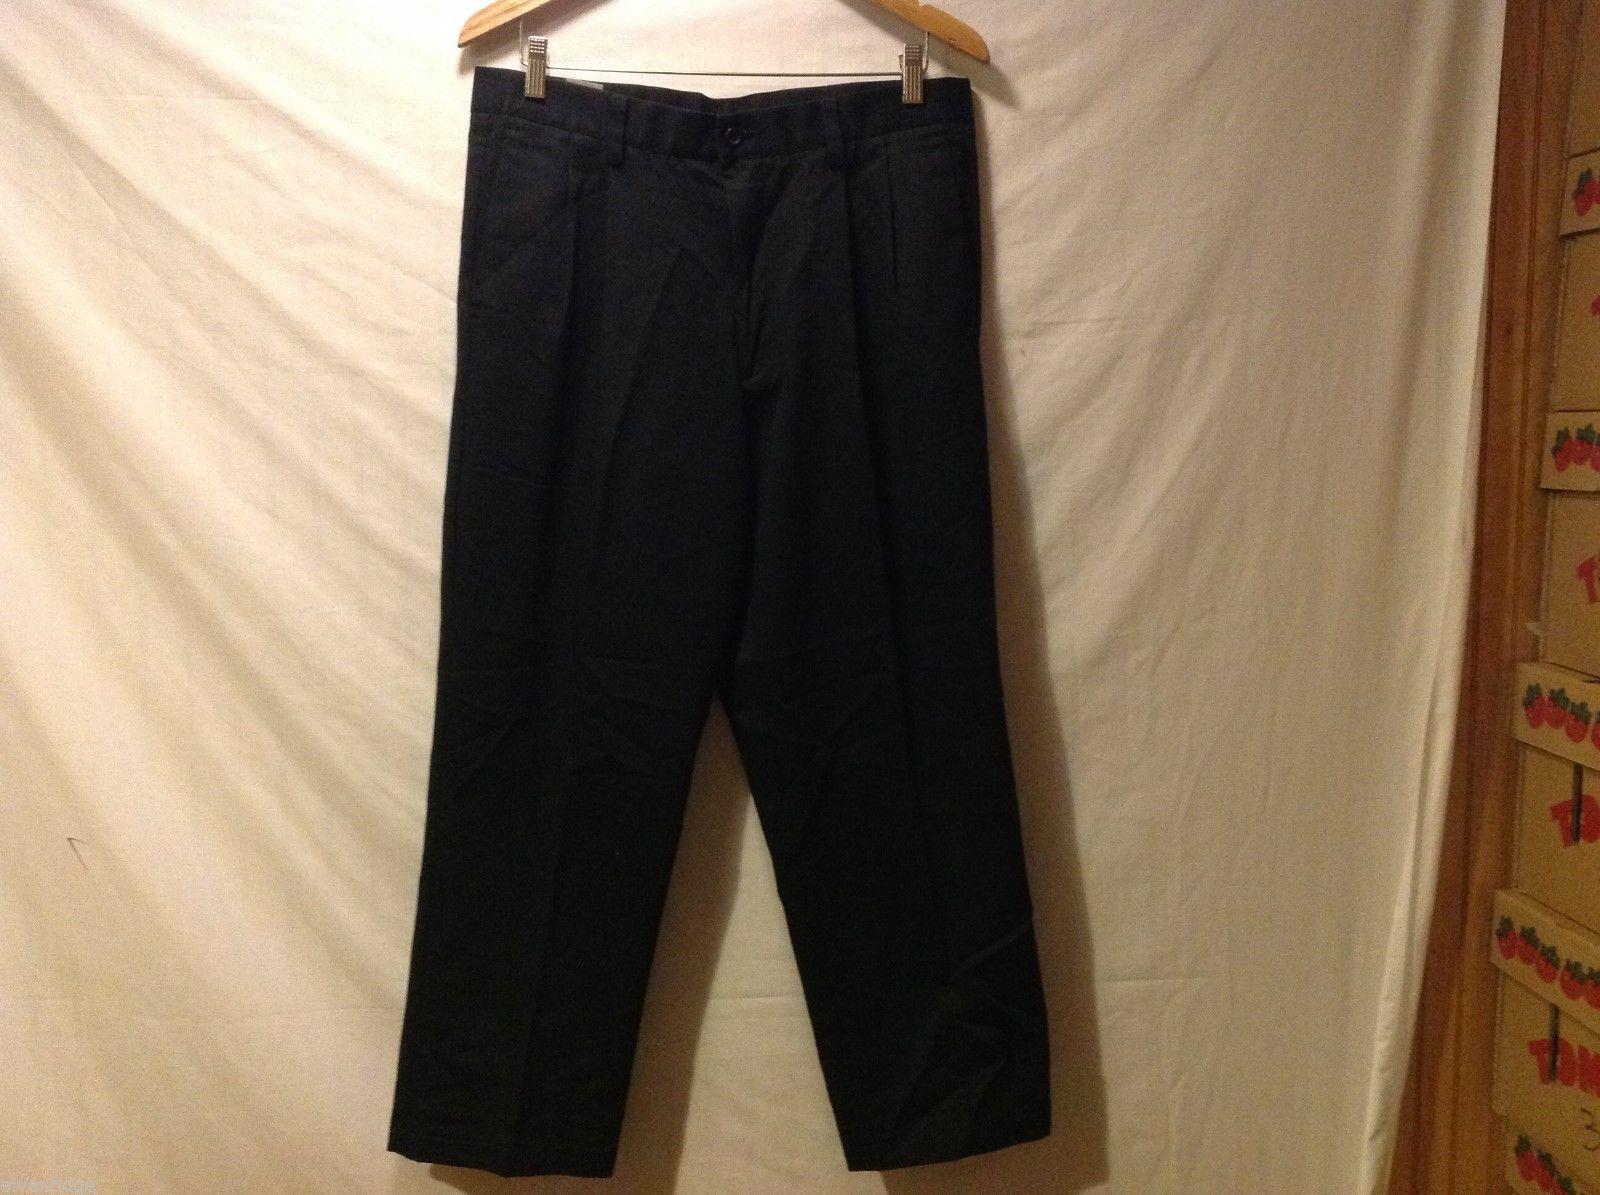 Dockers Mens Black Pleated Dress Pants, Size W34 L28